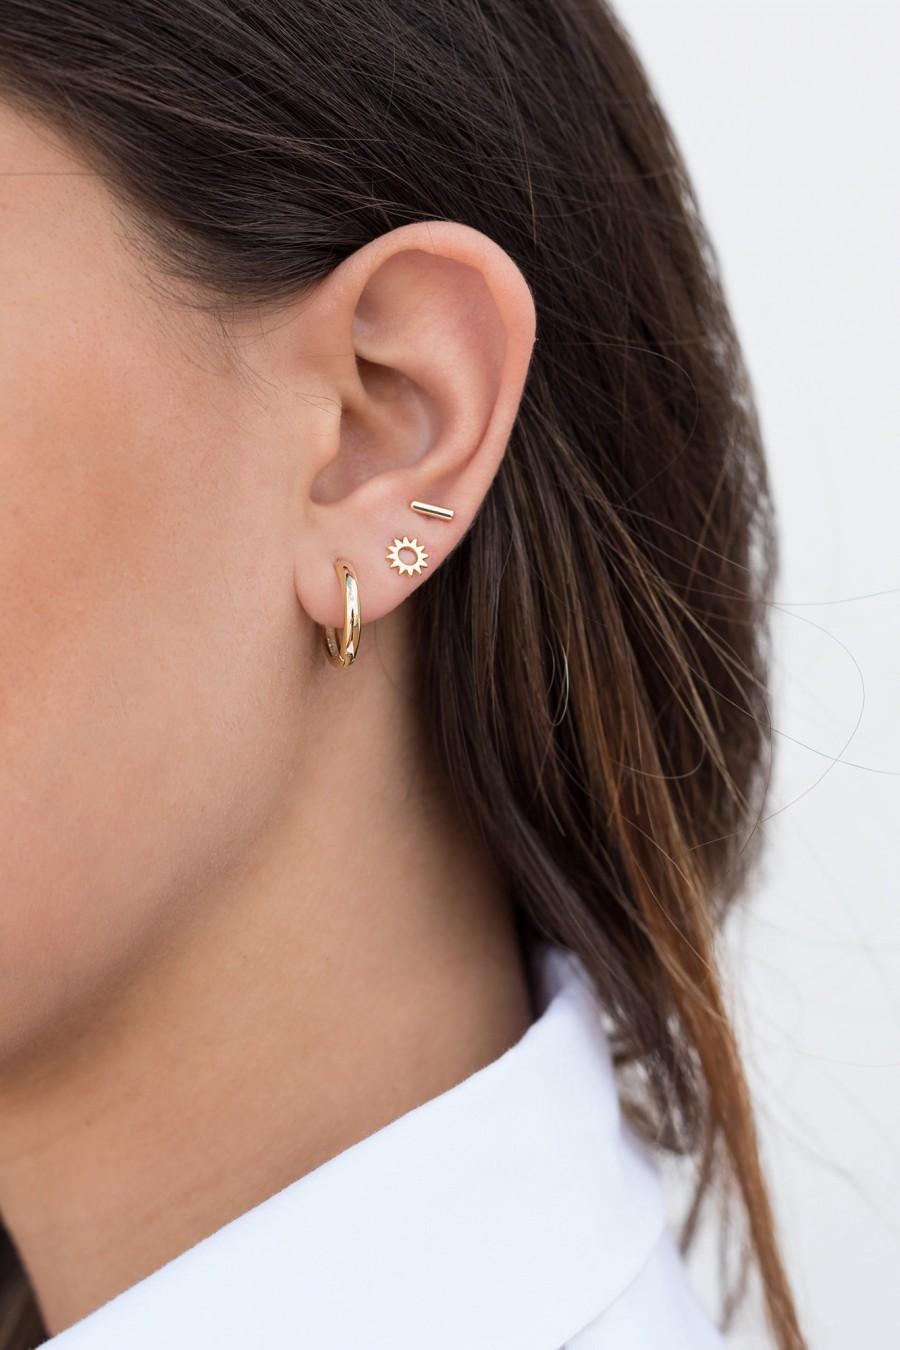 Свадьба - Sun stud earrings, Sun-shaped earrings, Small earrings, Dainty stud earrings, Trendy earrings, Minimalist earrings, Mini earrings, Tiny stud